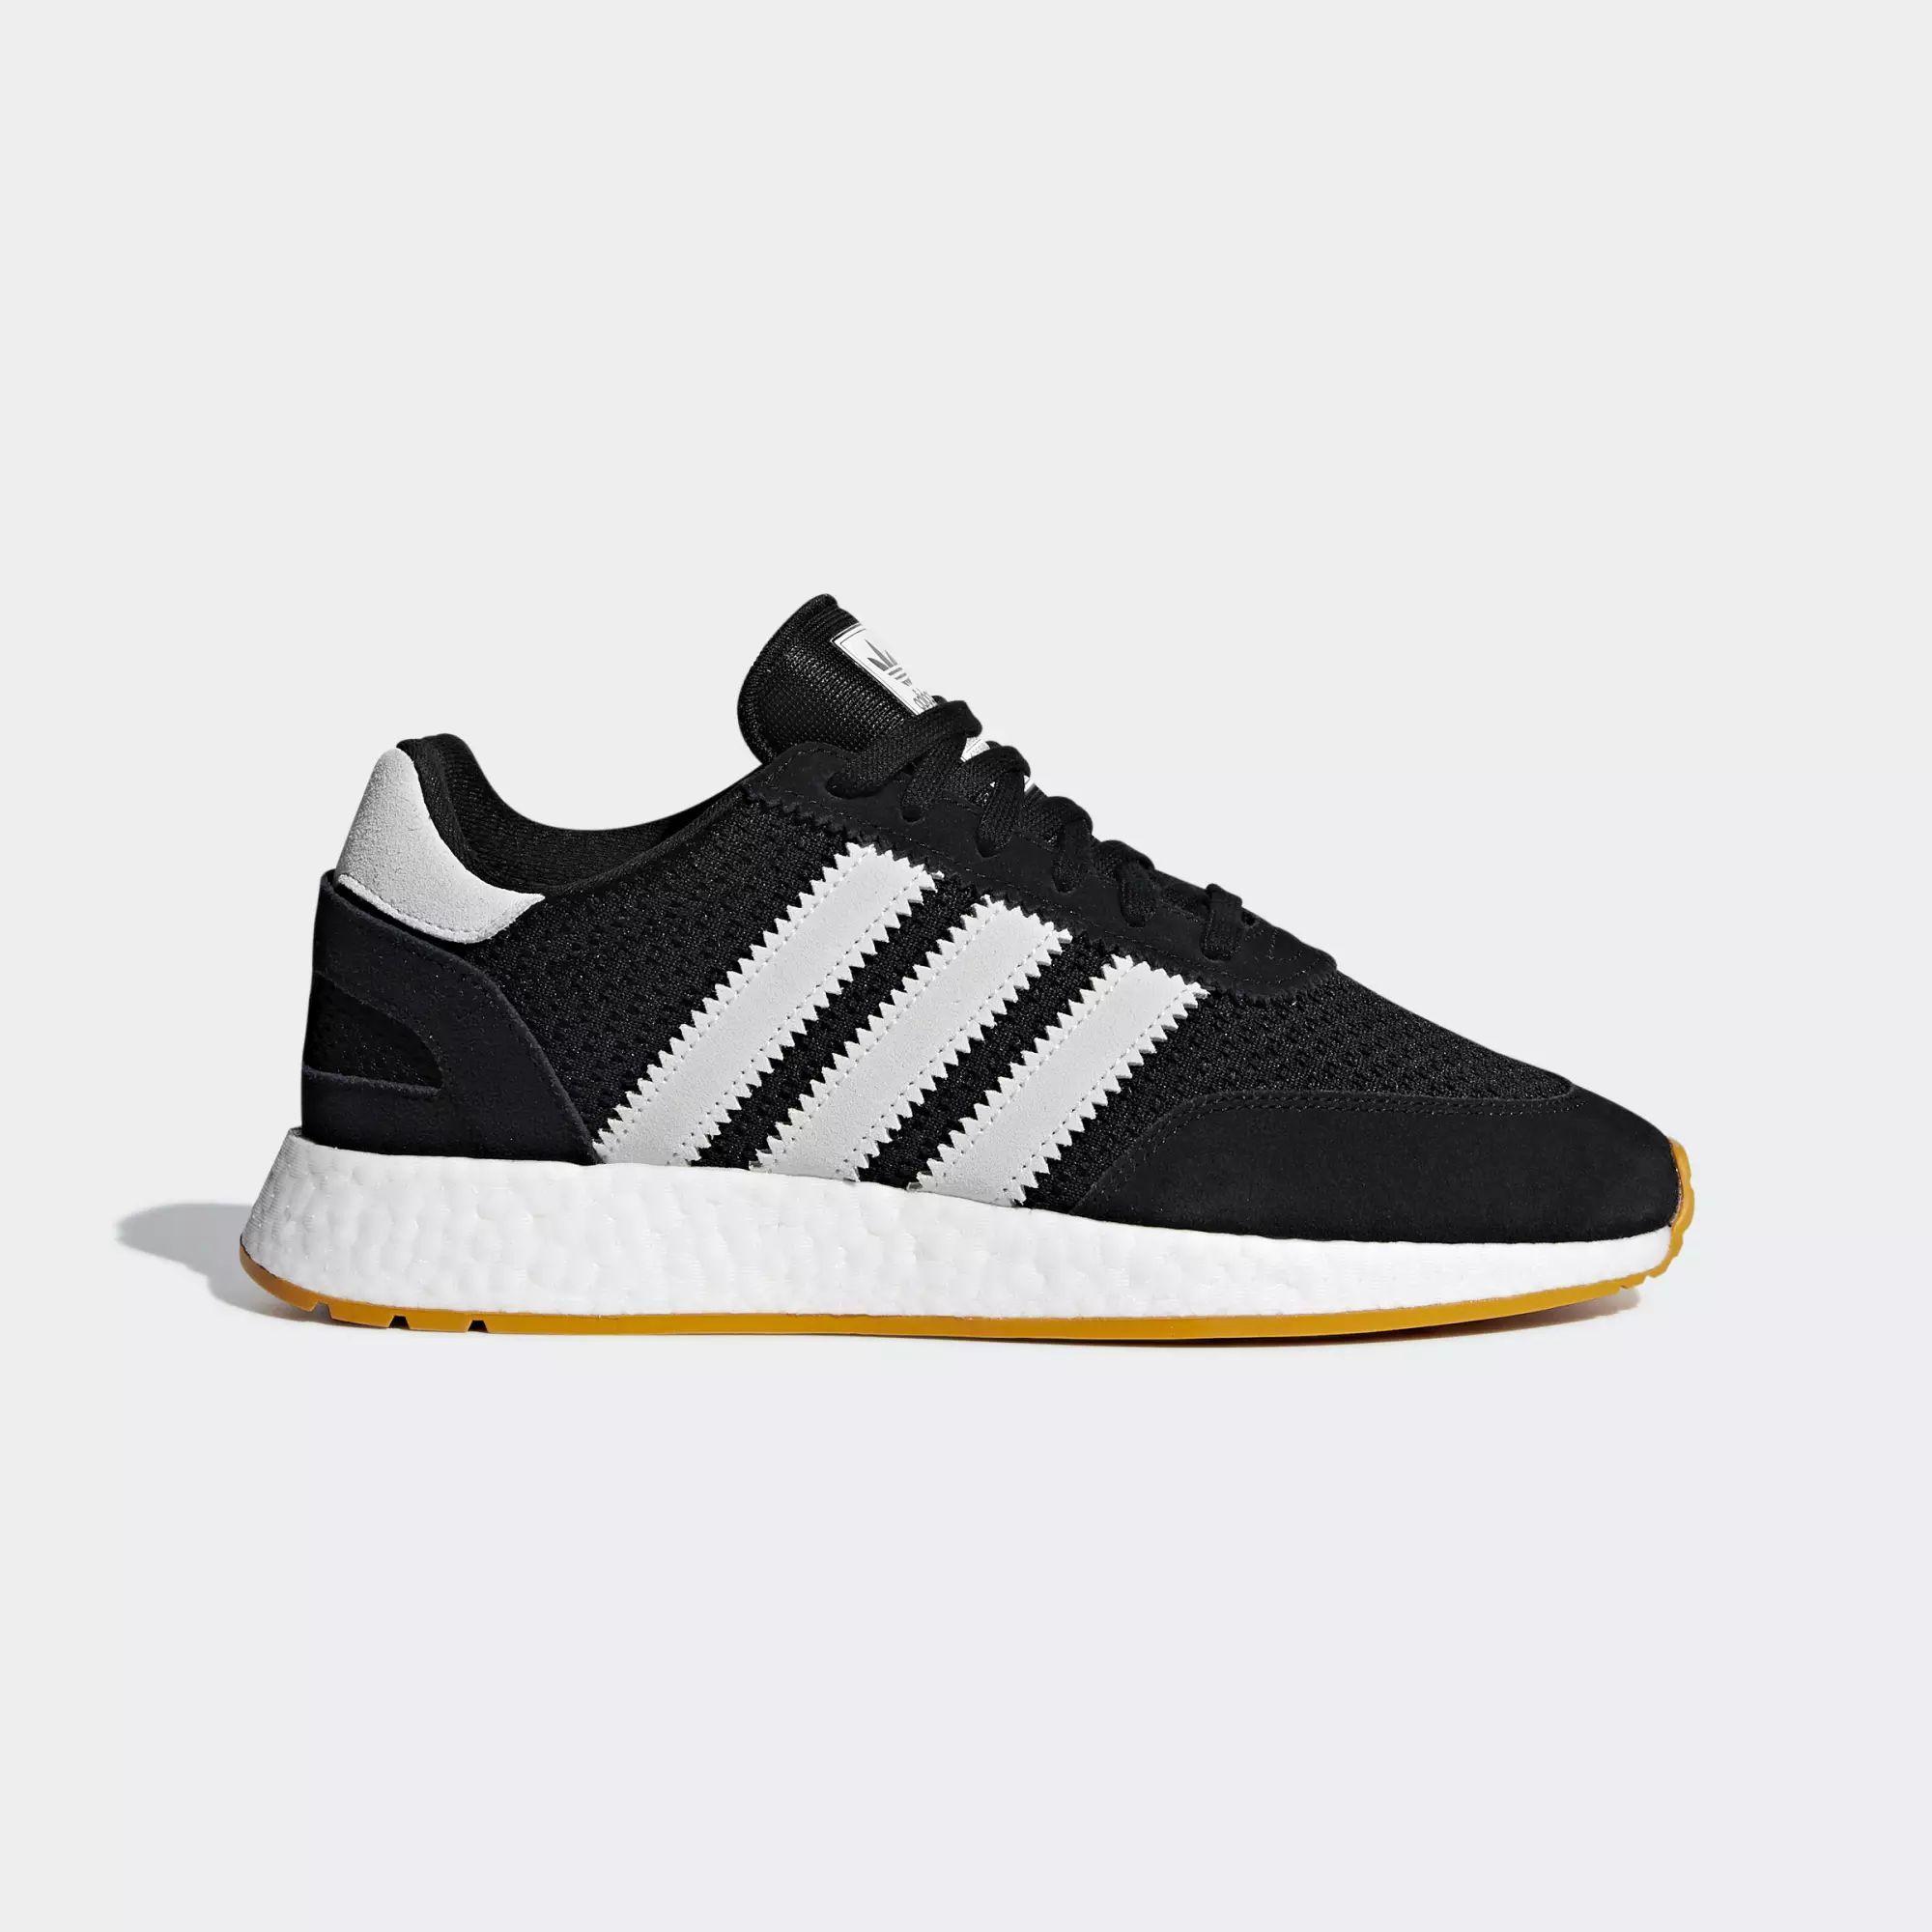 Details zu Adidas I 5923 schwarz BD7525 triple black Iniki Sneaker Originals Männer Schuhe